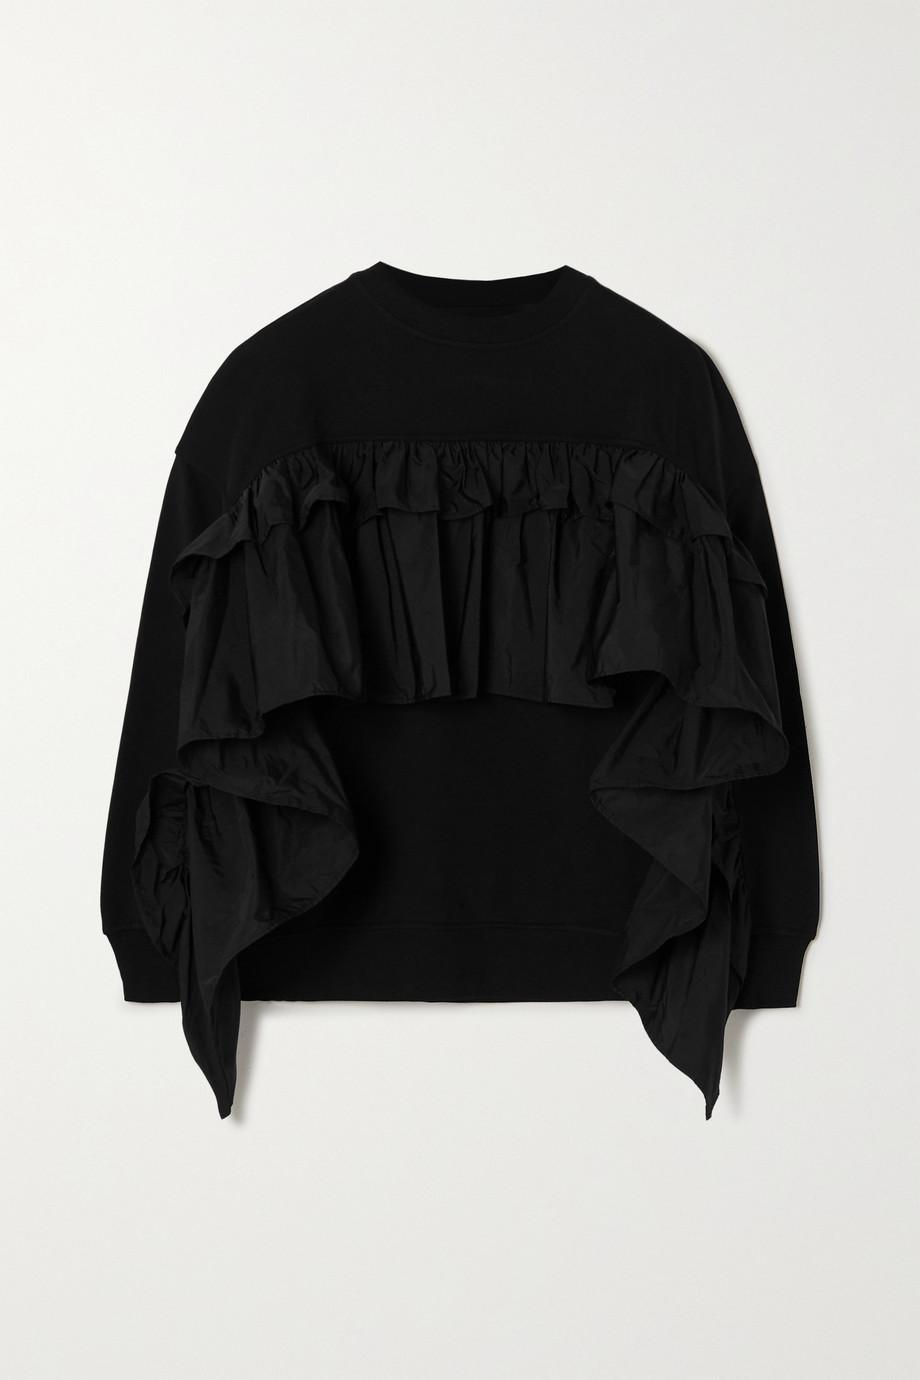 REDValentino Ruffled taffeta-trimmed cotton-blend jersey sweatshirt